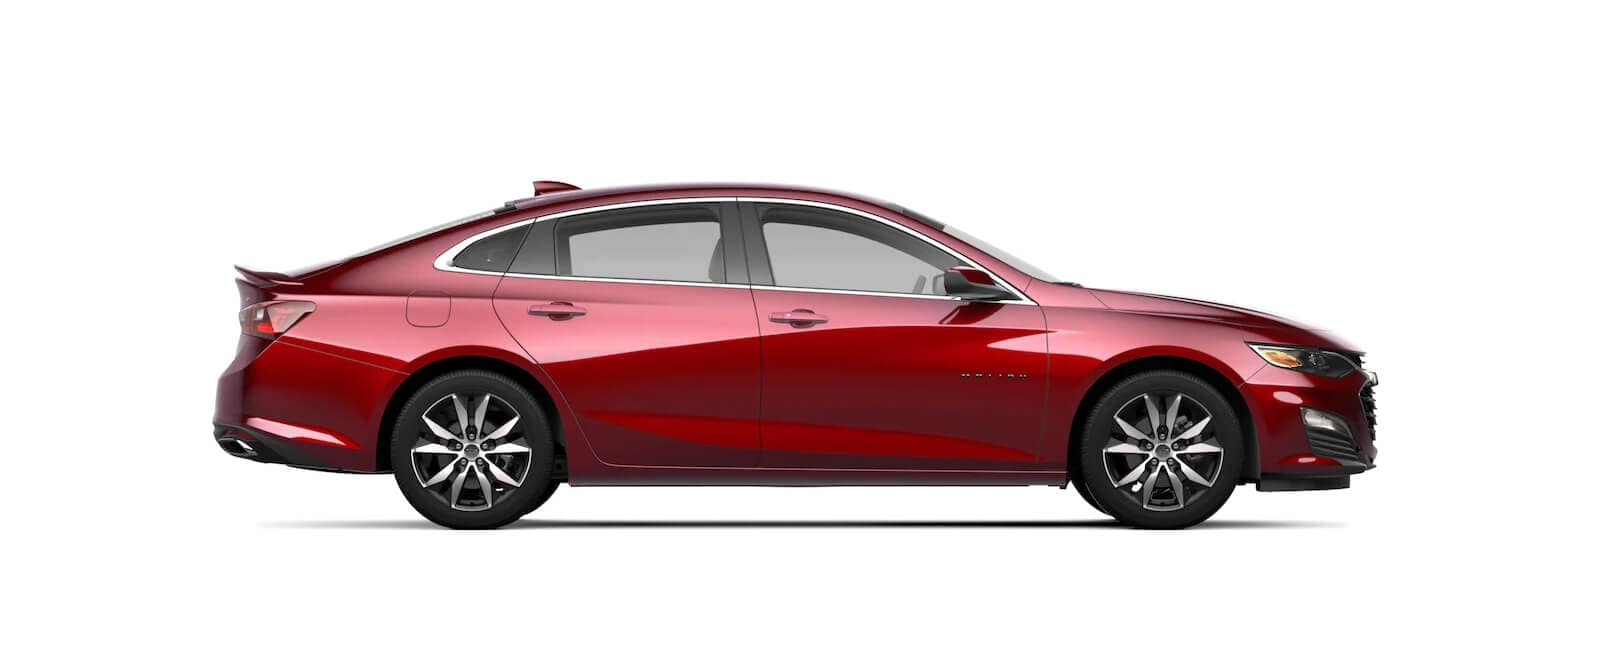 New Chevrolet Vehicles: 2021 Malibu